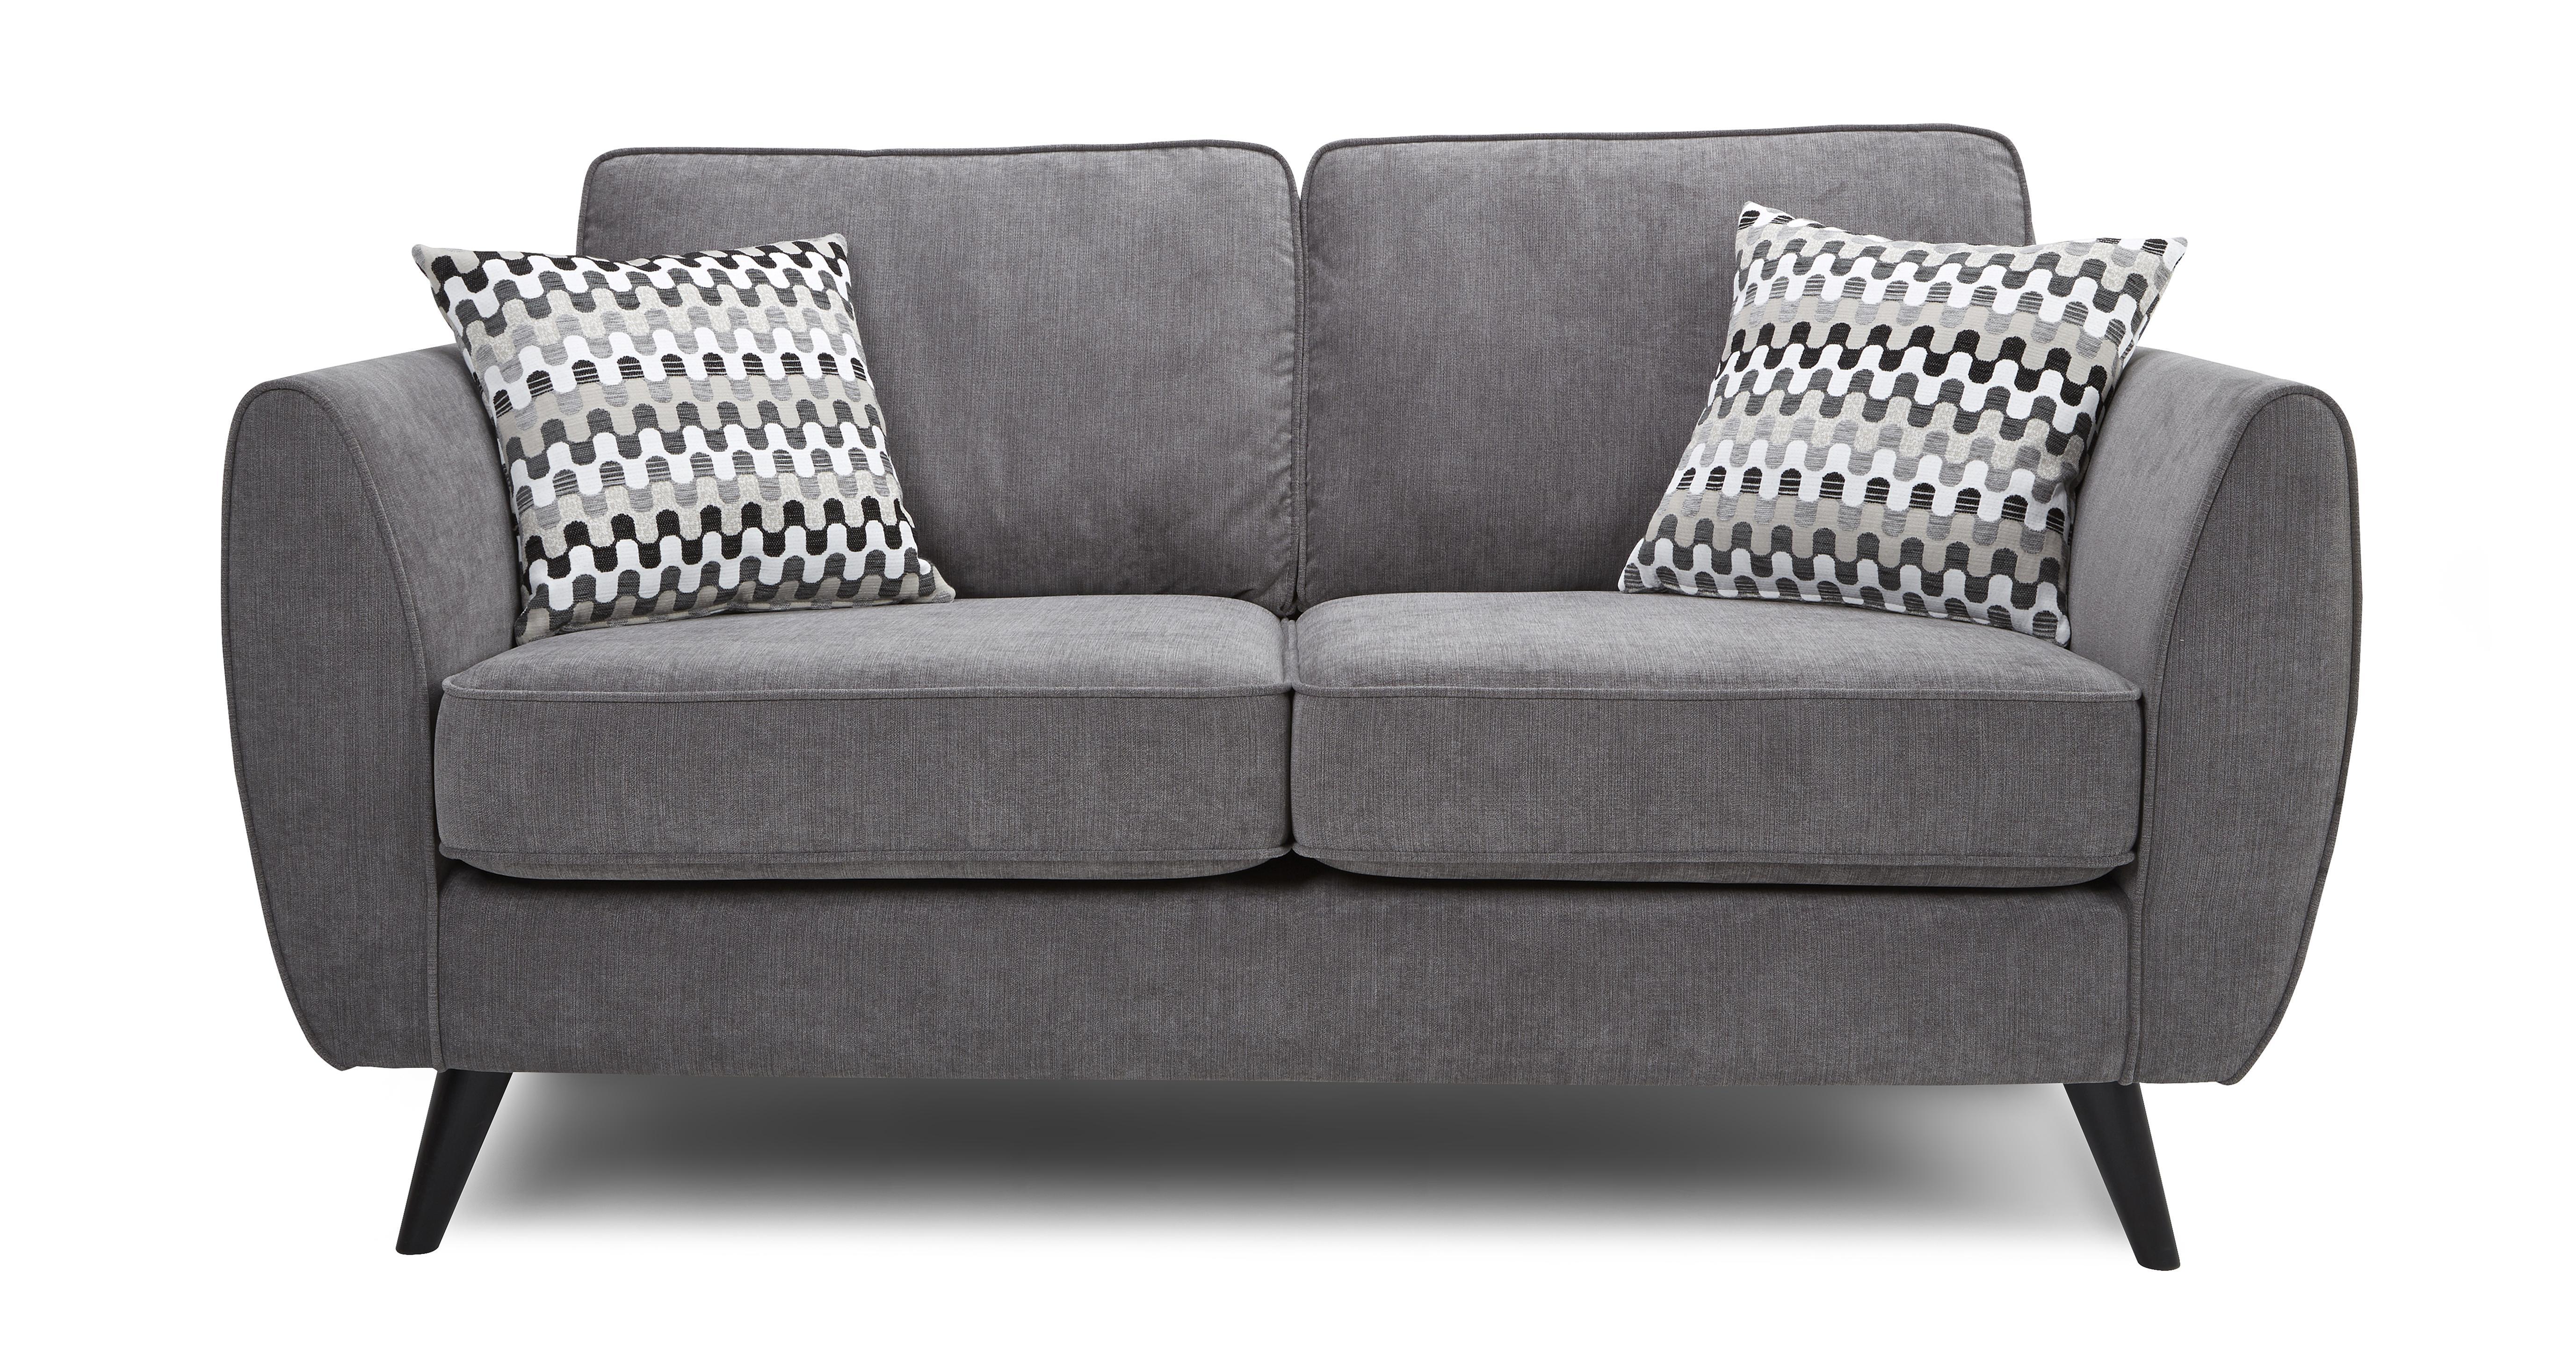 2 seater sofa JLMDVMZ